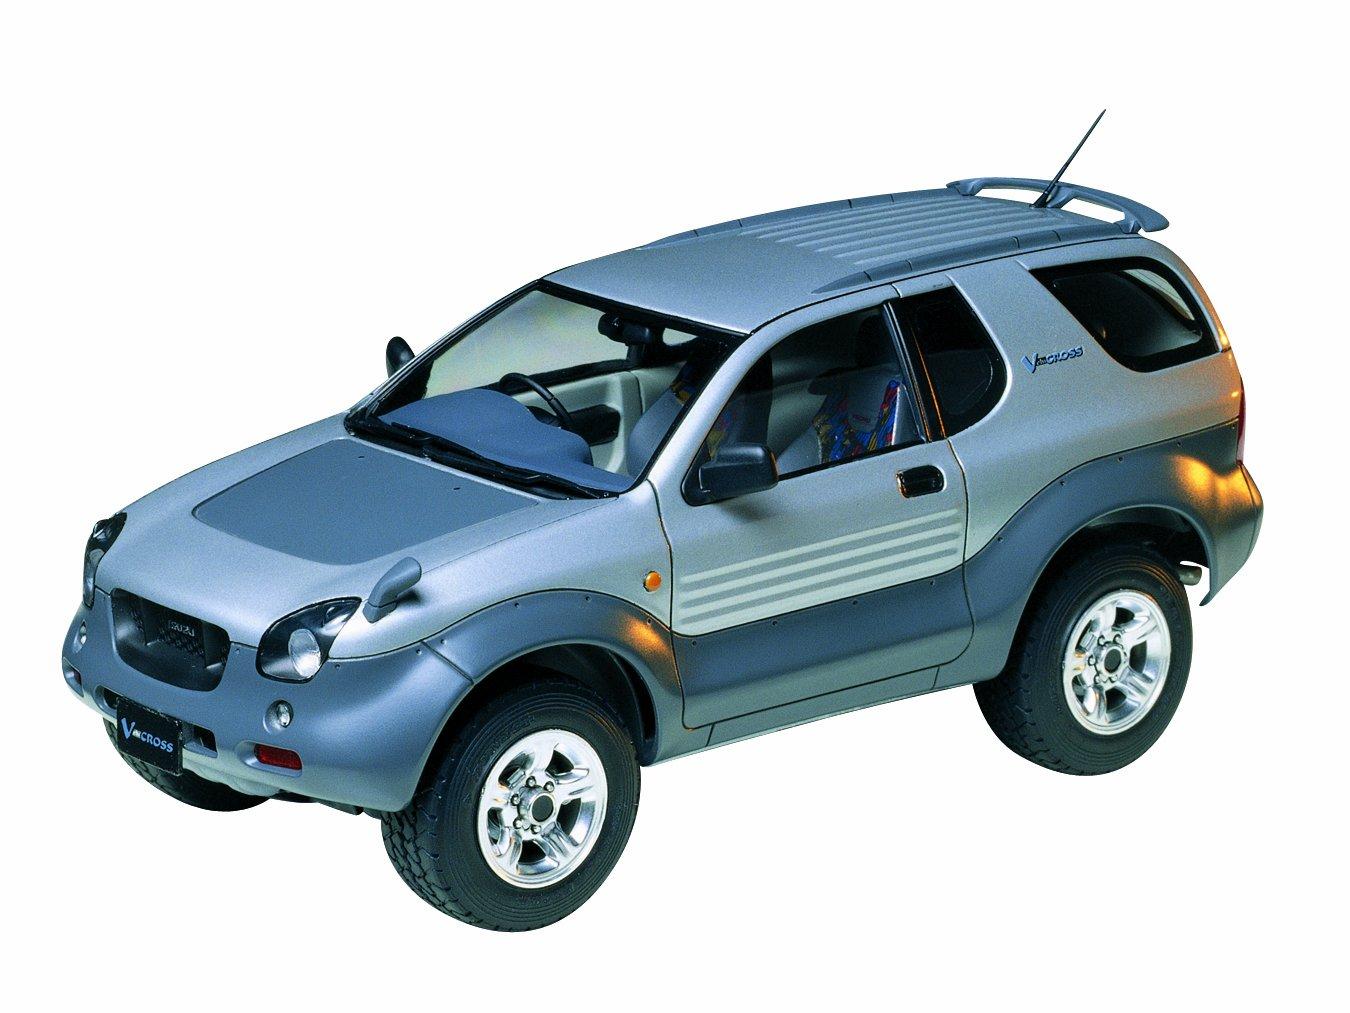 Amazon tamiya 24191 124 isuzu vehicross toys games sciox Image collections